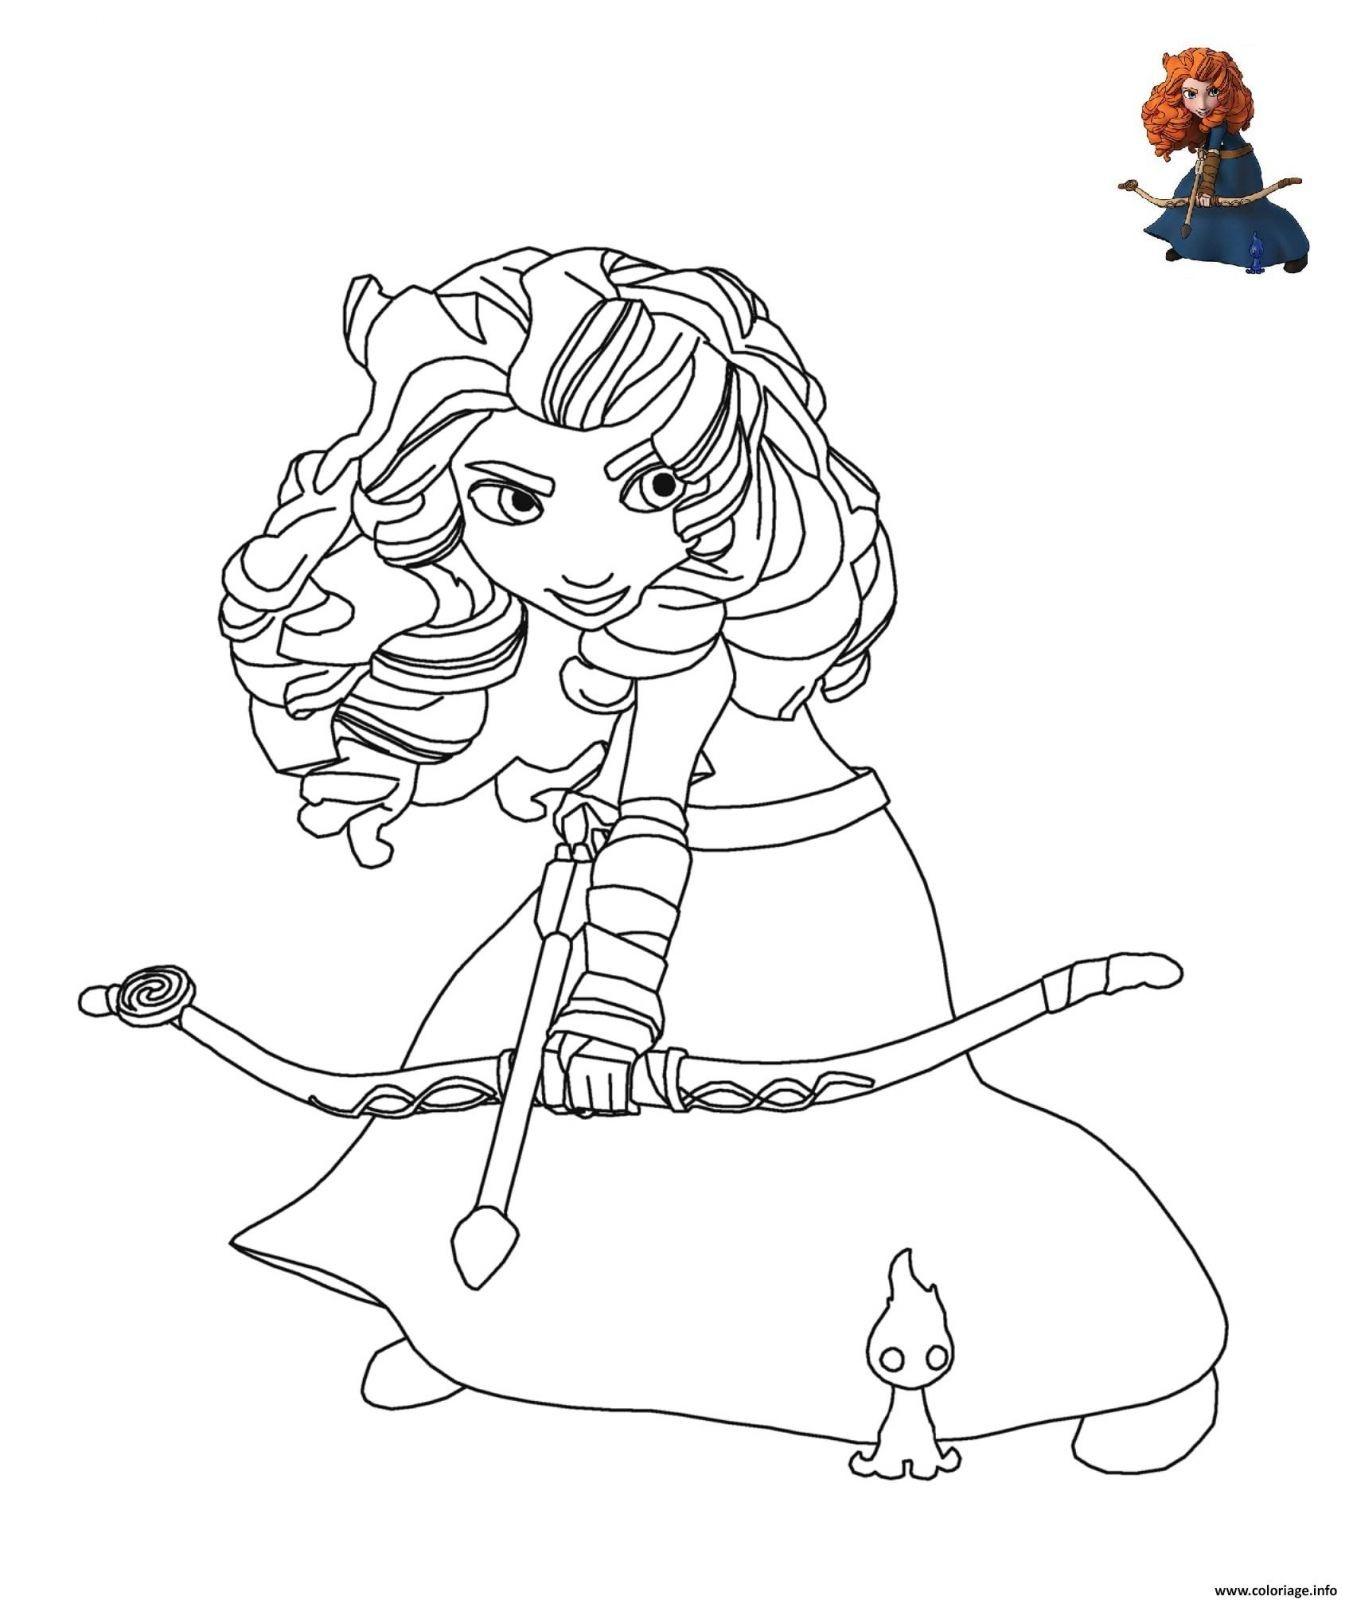 Princesse Disney Rebelle Coloriage   Coloriages À Imprimer avec Coloriage Princesses Disney À Imprimer